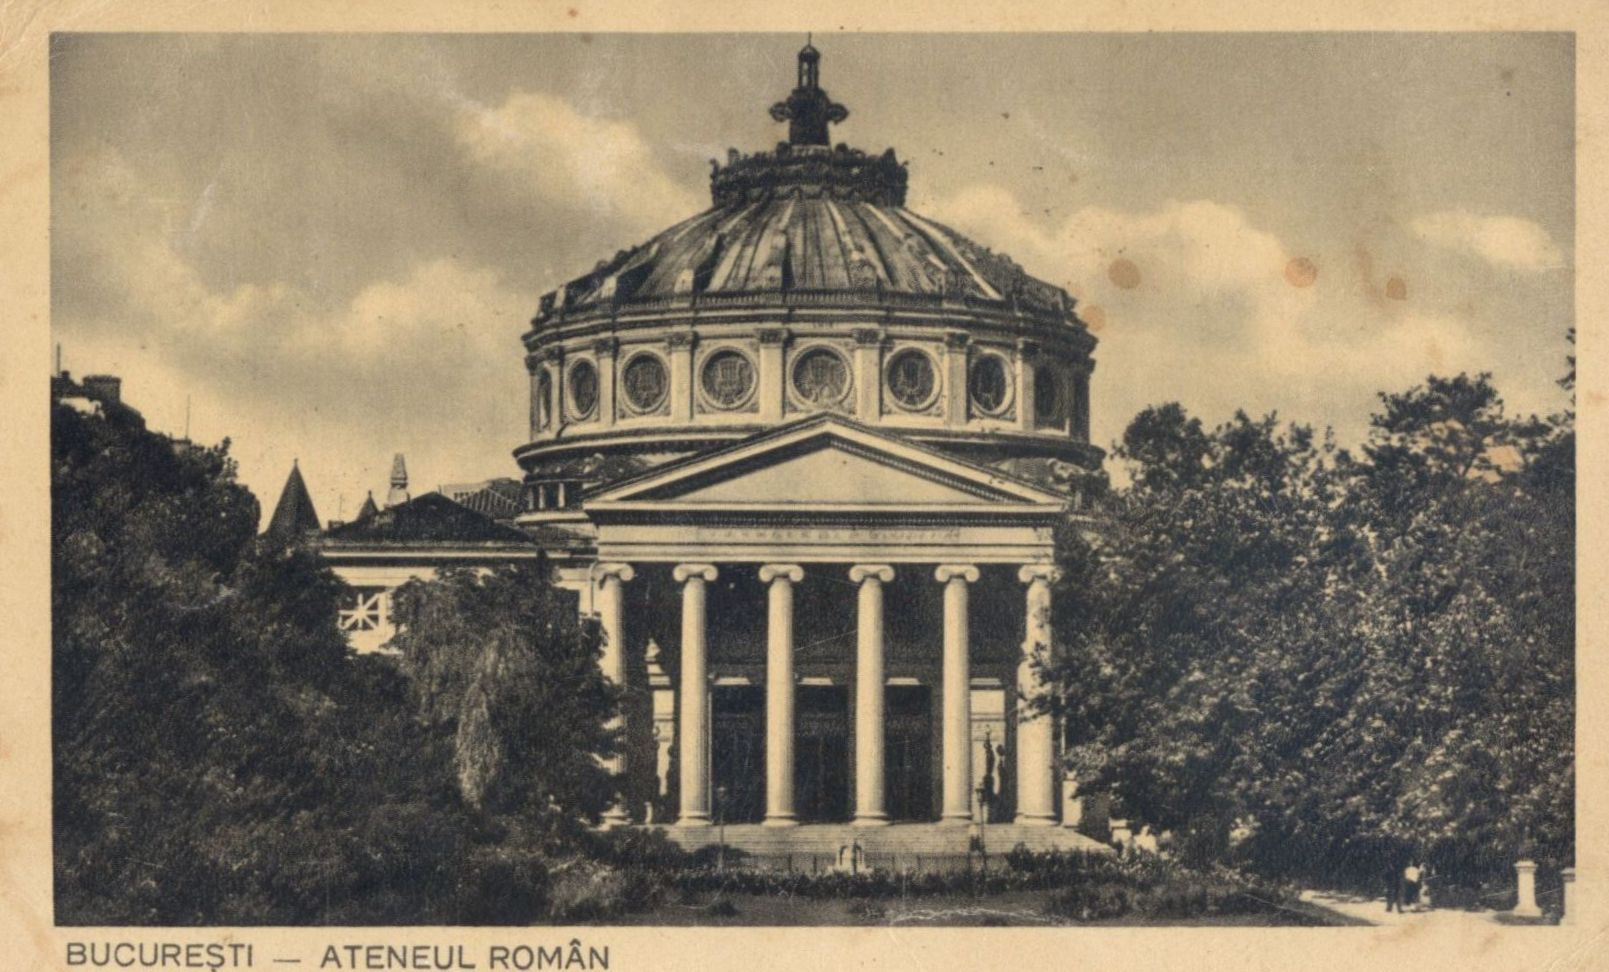 Concert aniversar : Ateneul Român – 130 de ani de la inaugurare